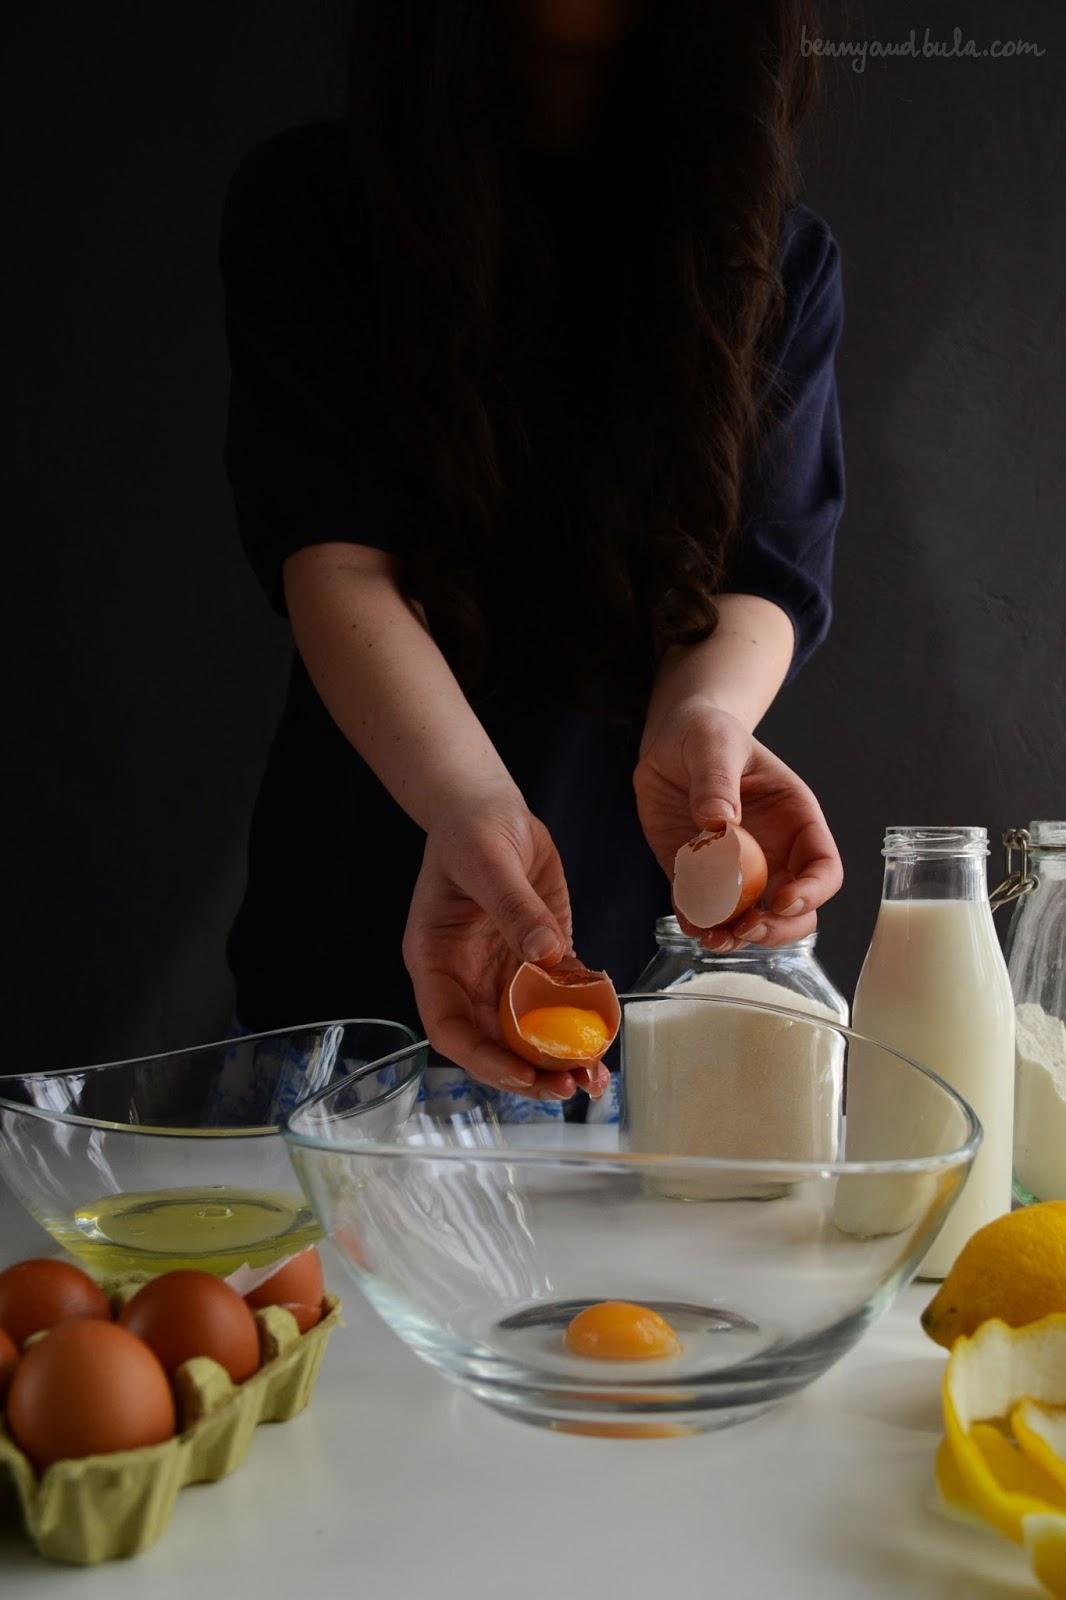 crema pasticcera vulcanica/ pastry cream recipe